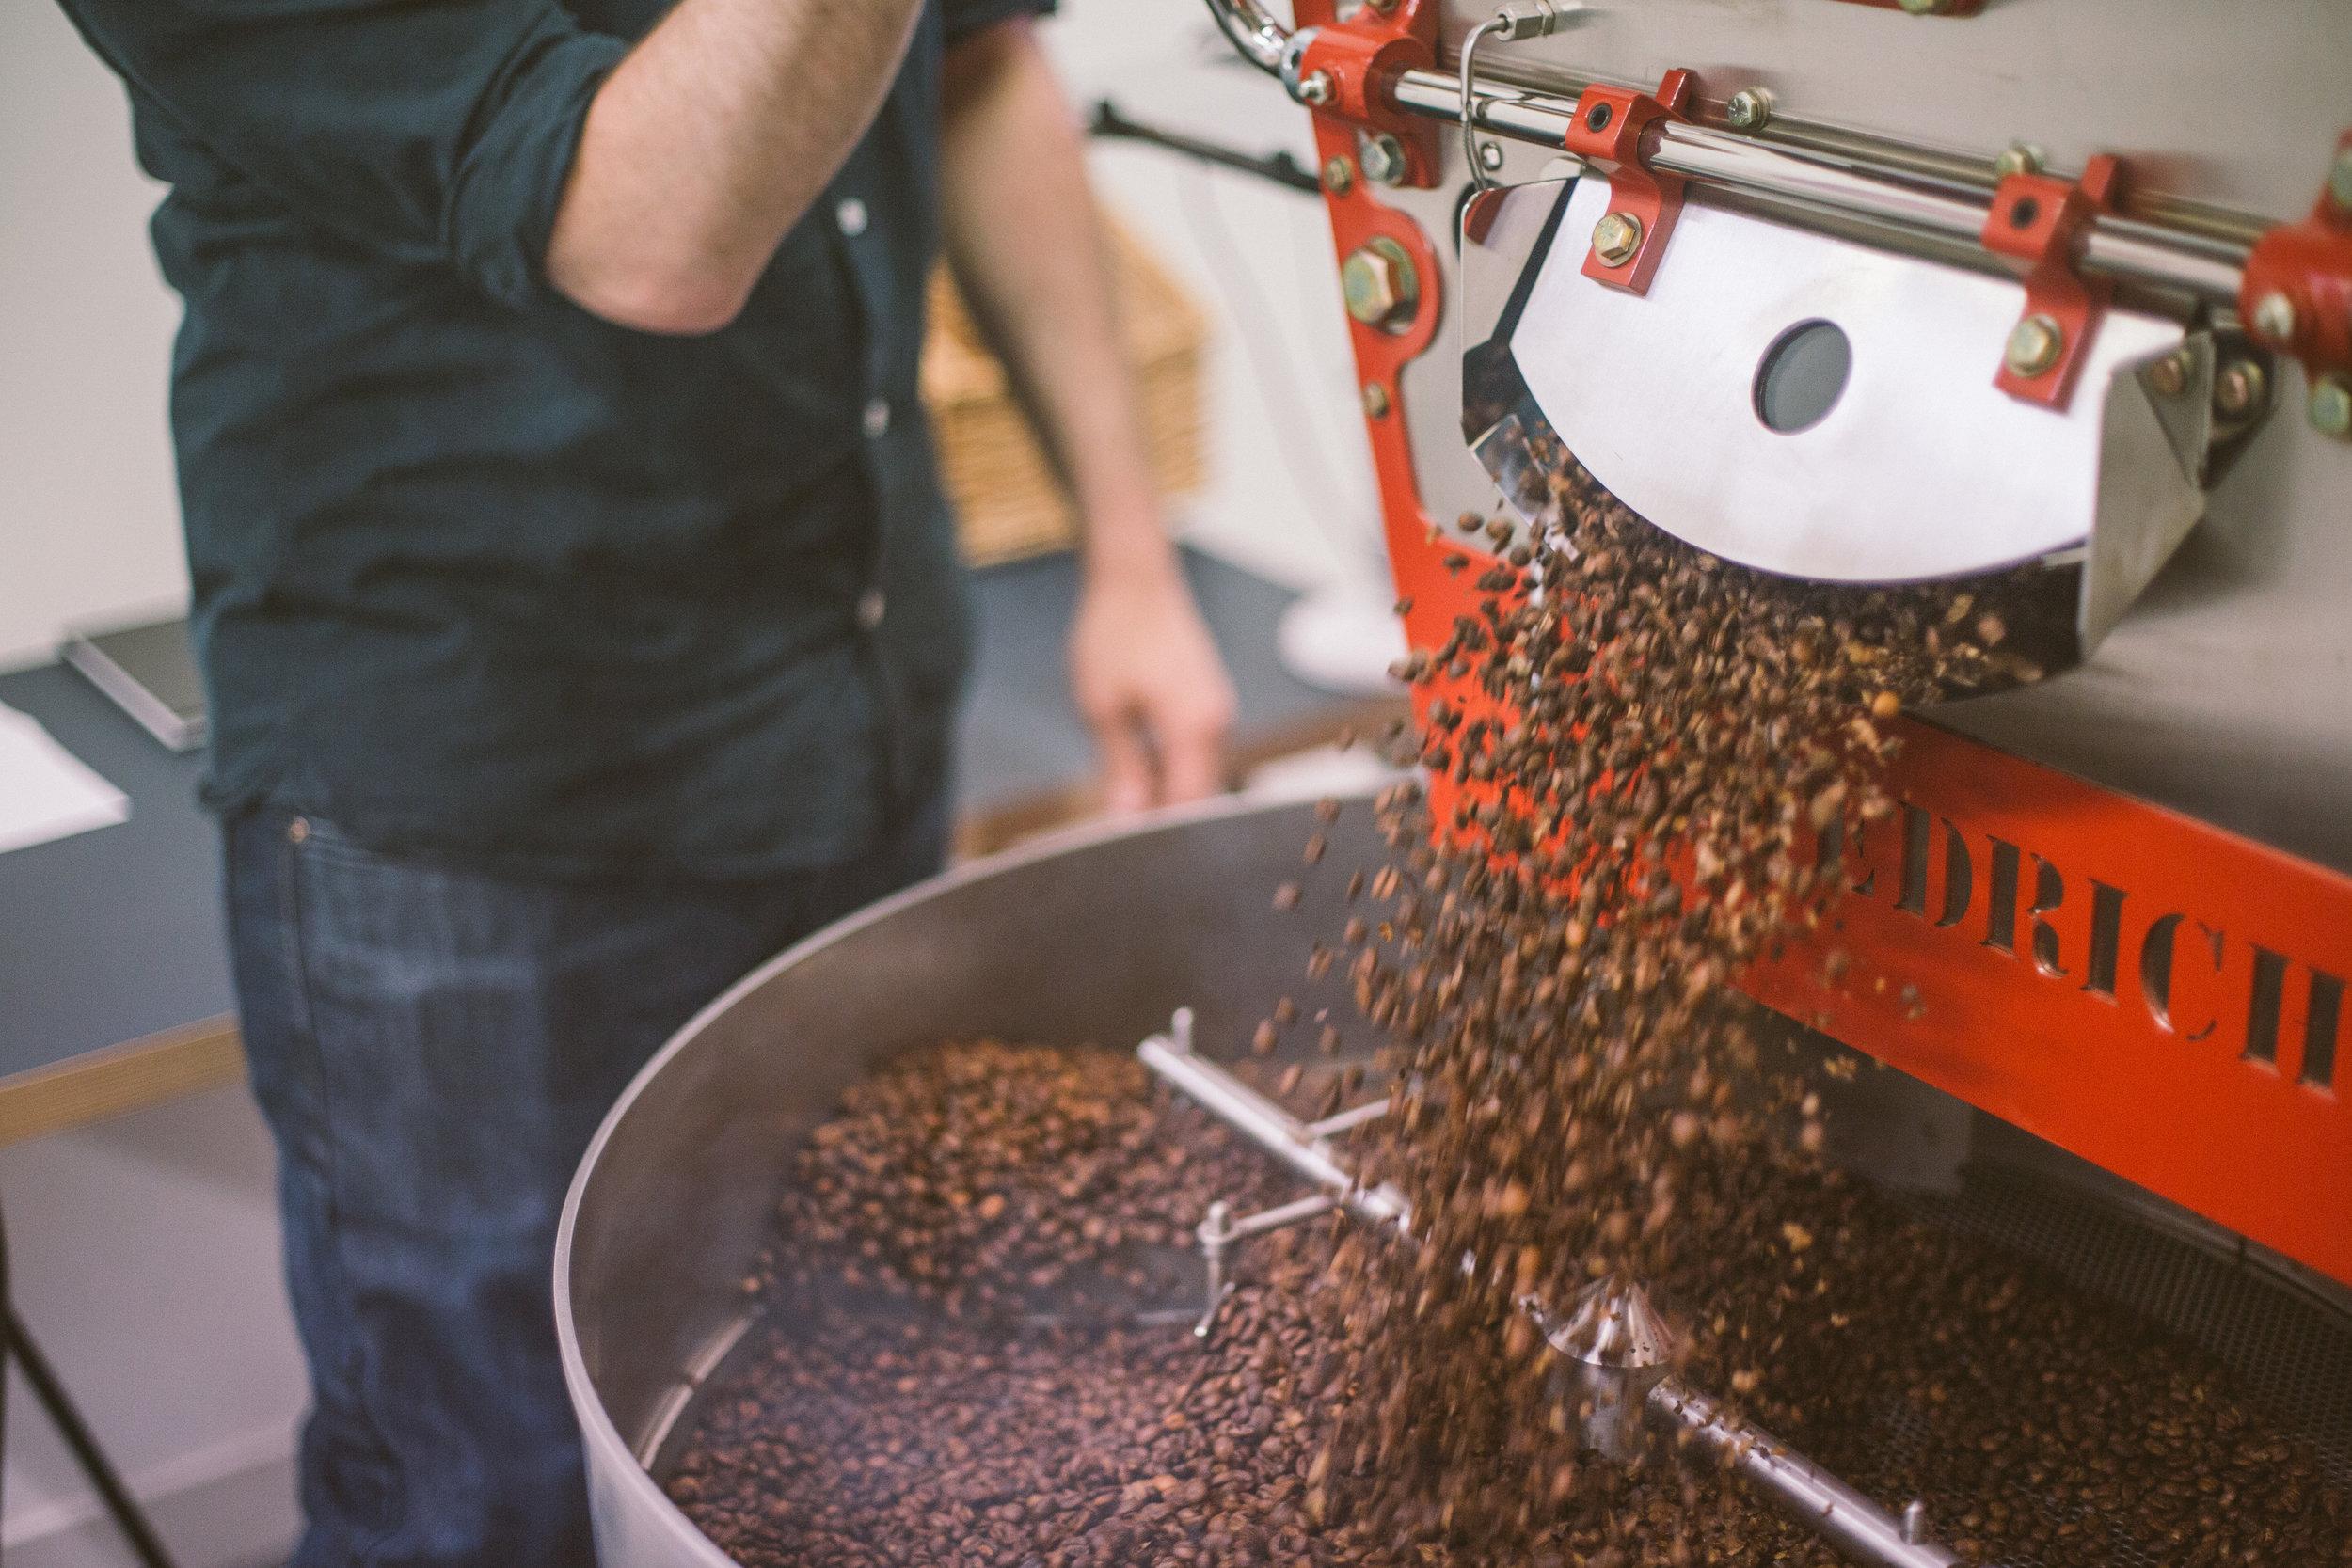 SEASONAL COFFEE - ROASTED IN EDINBURGH